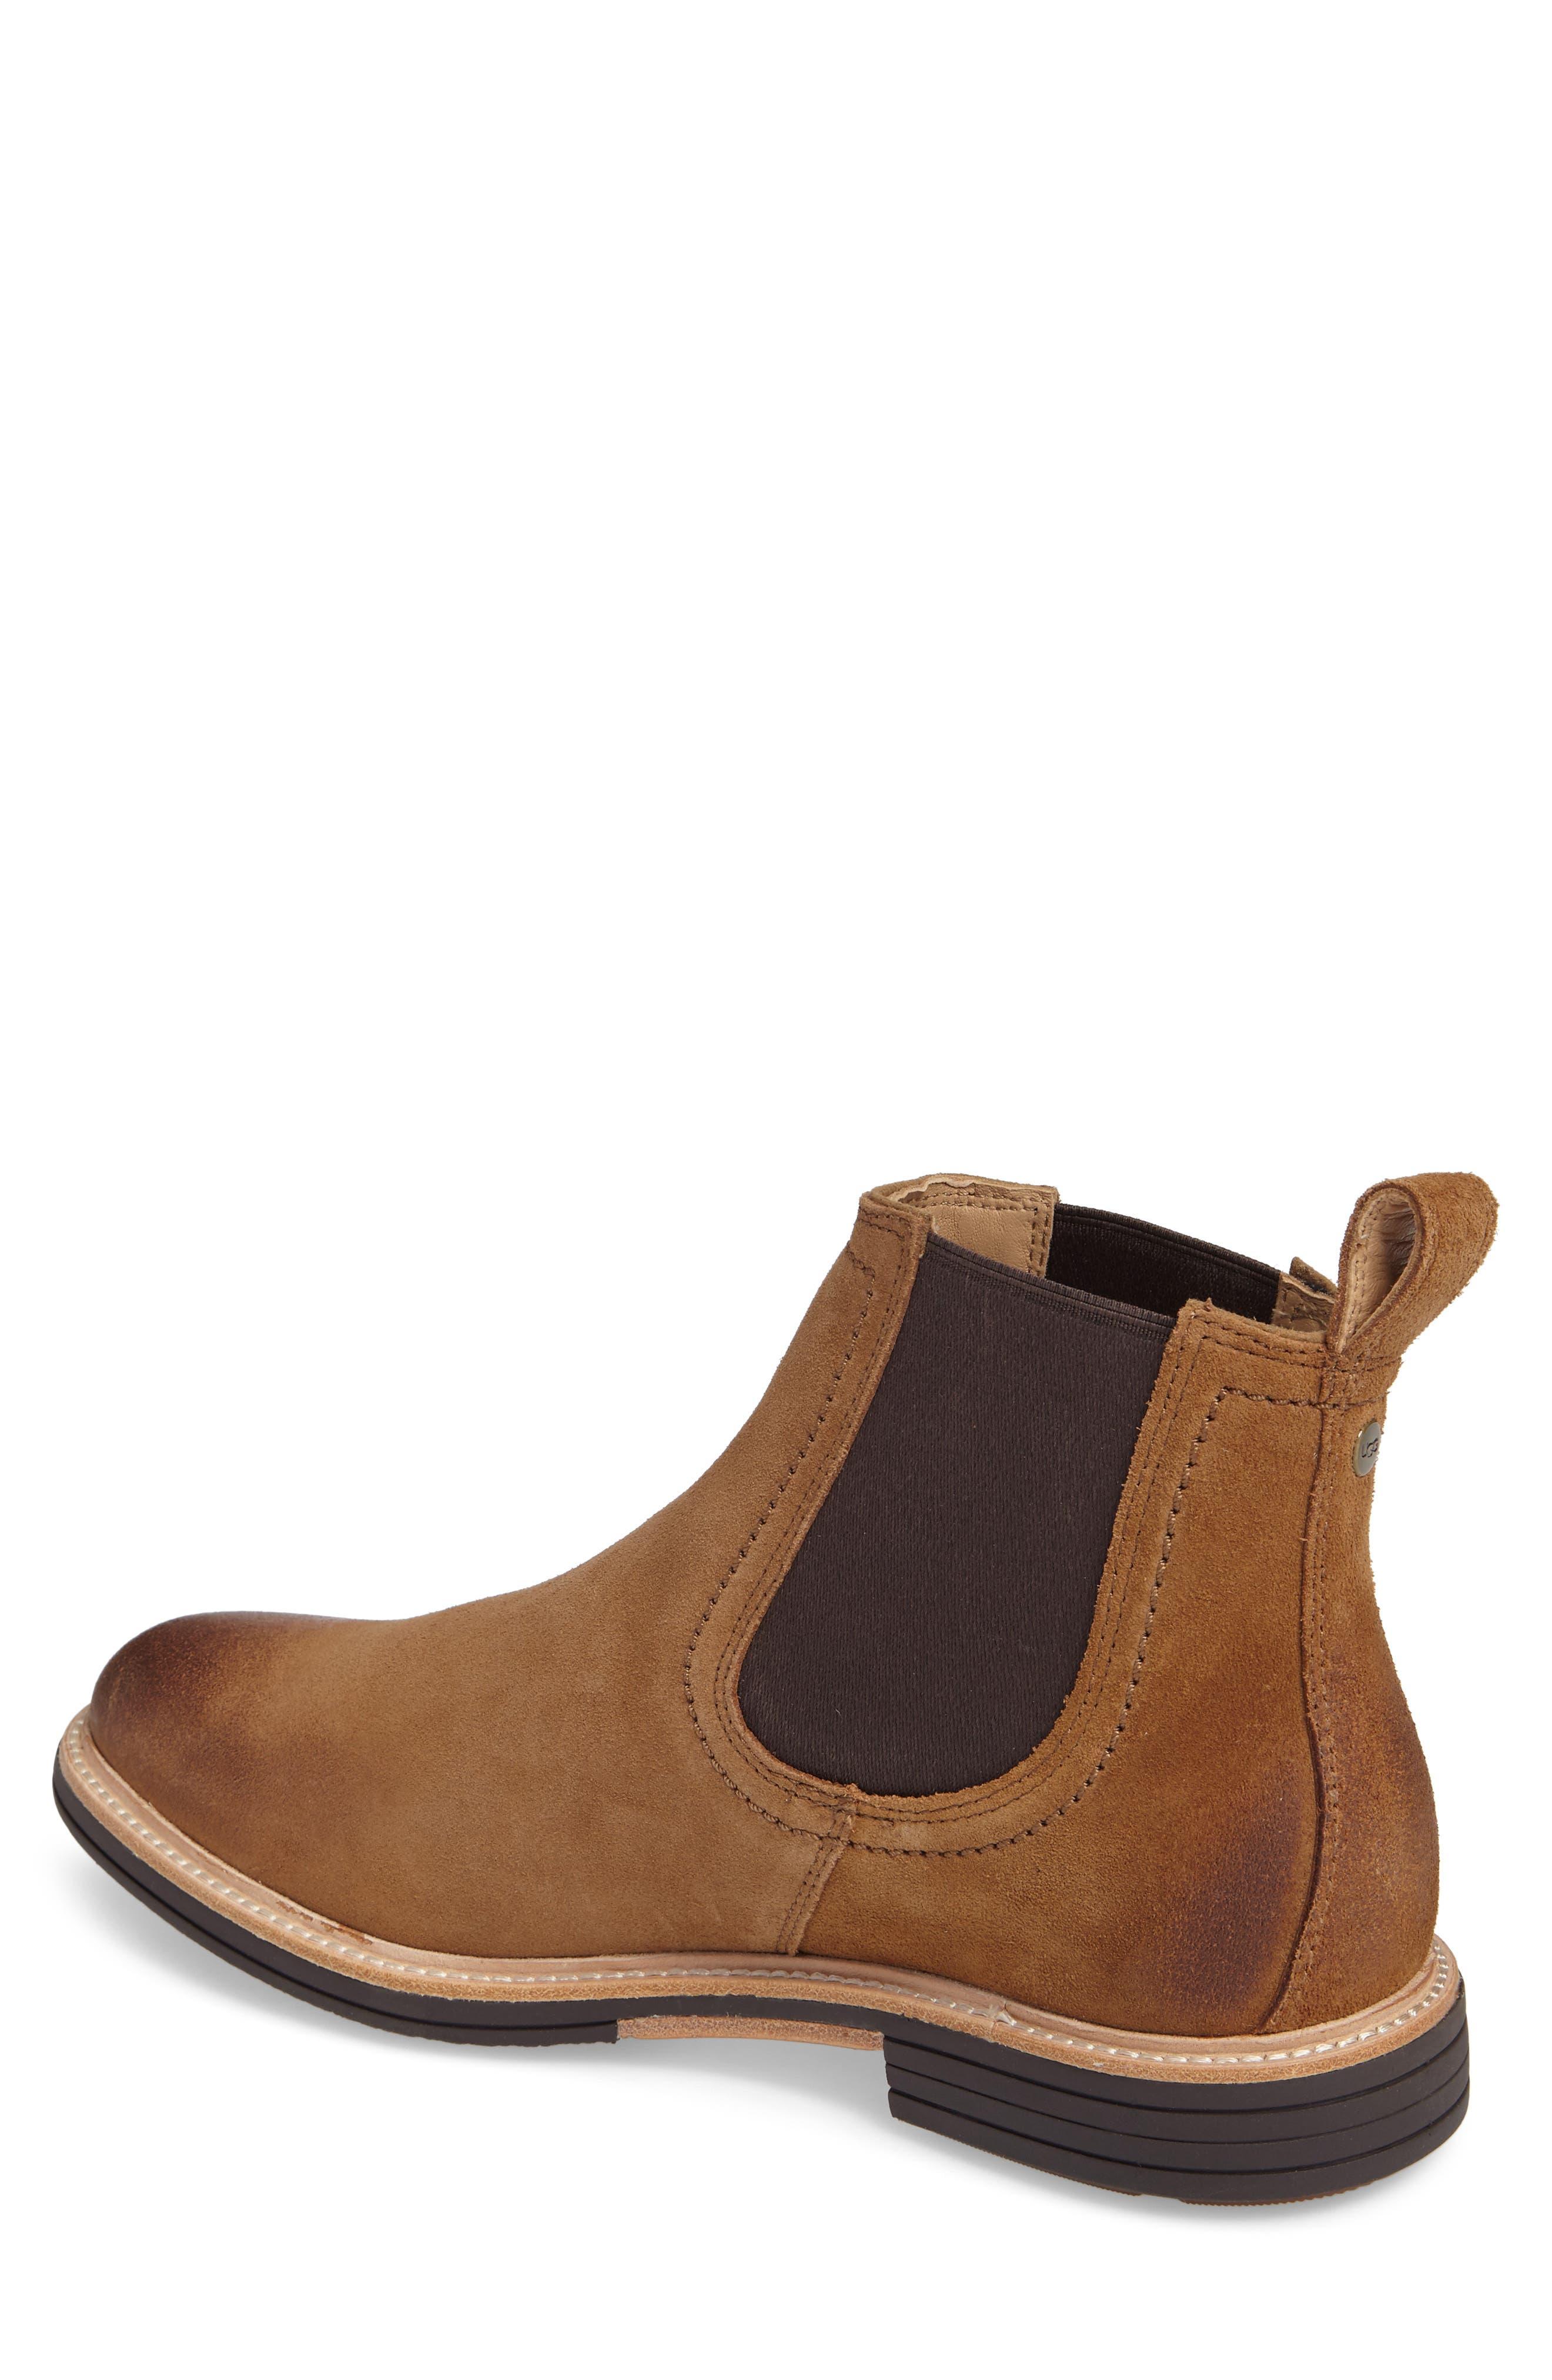 Alternate Image 2  - UGG® Baldvin Chelsea Boot (Men)